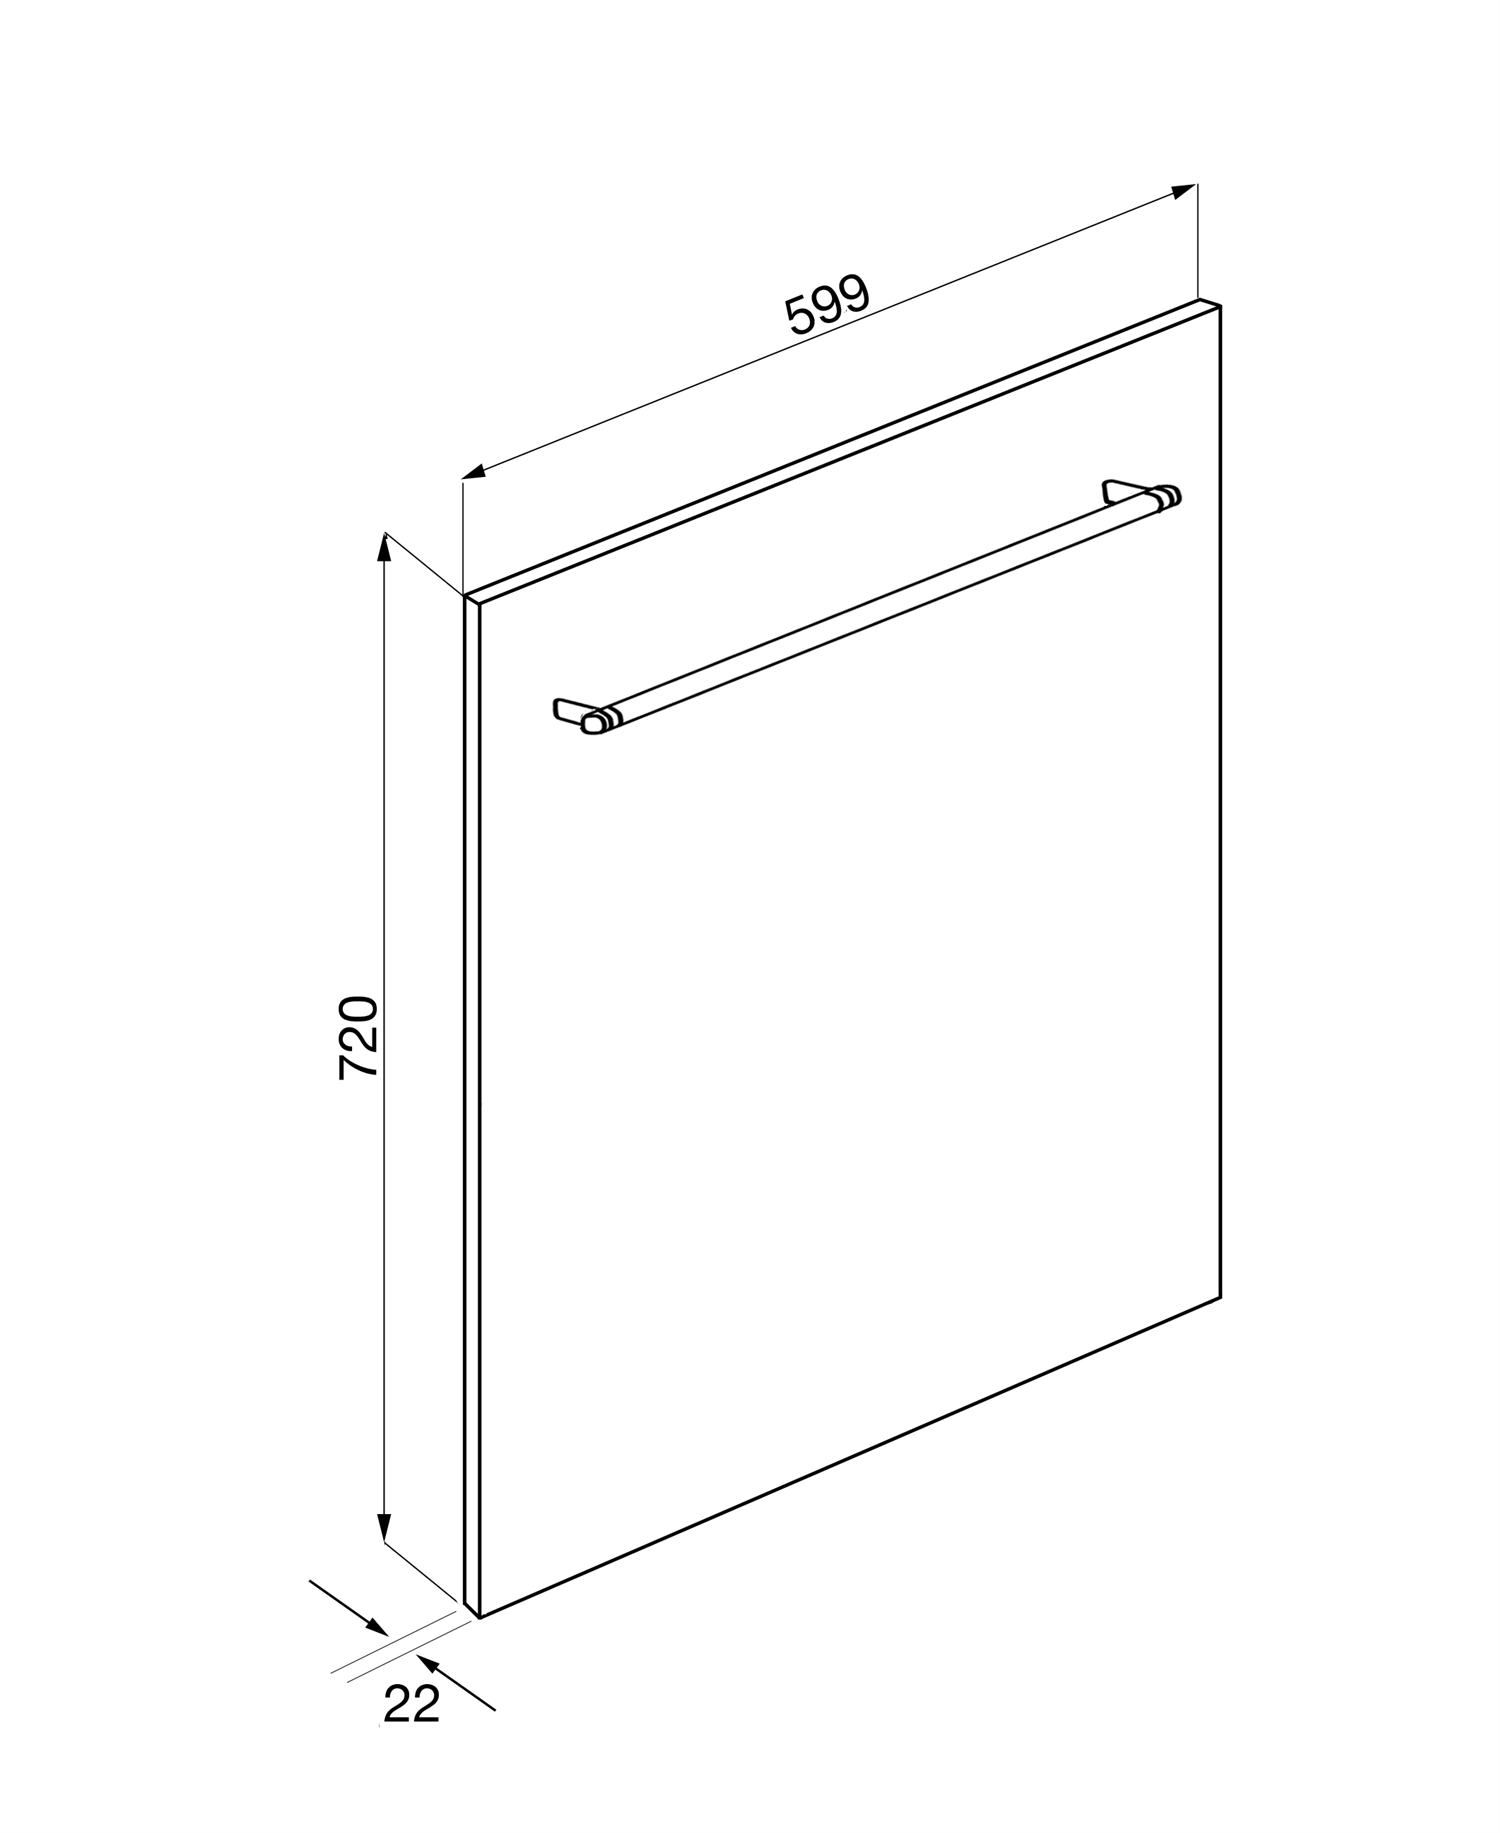 Maattekening SMEG voorzetdeur KIT6CXF